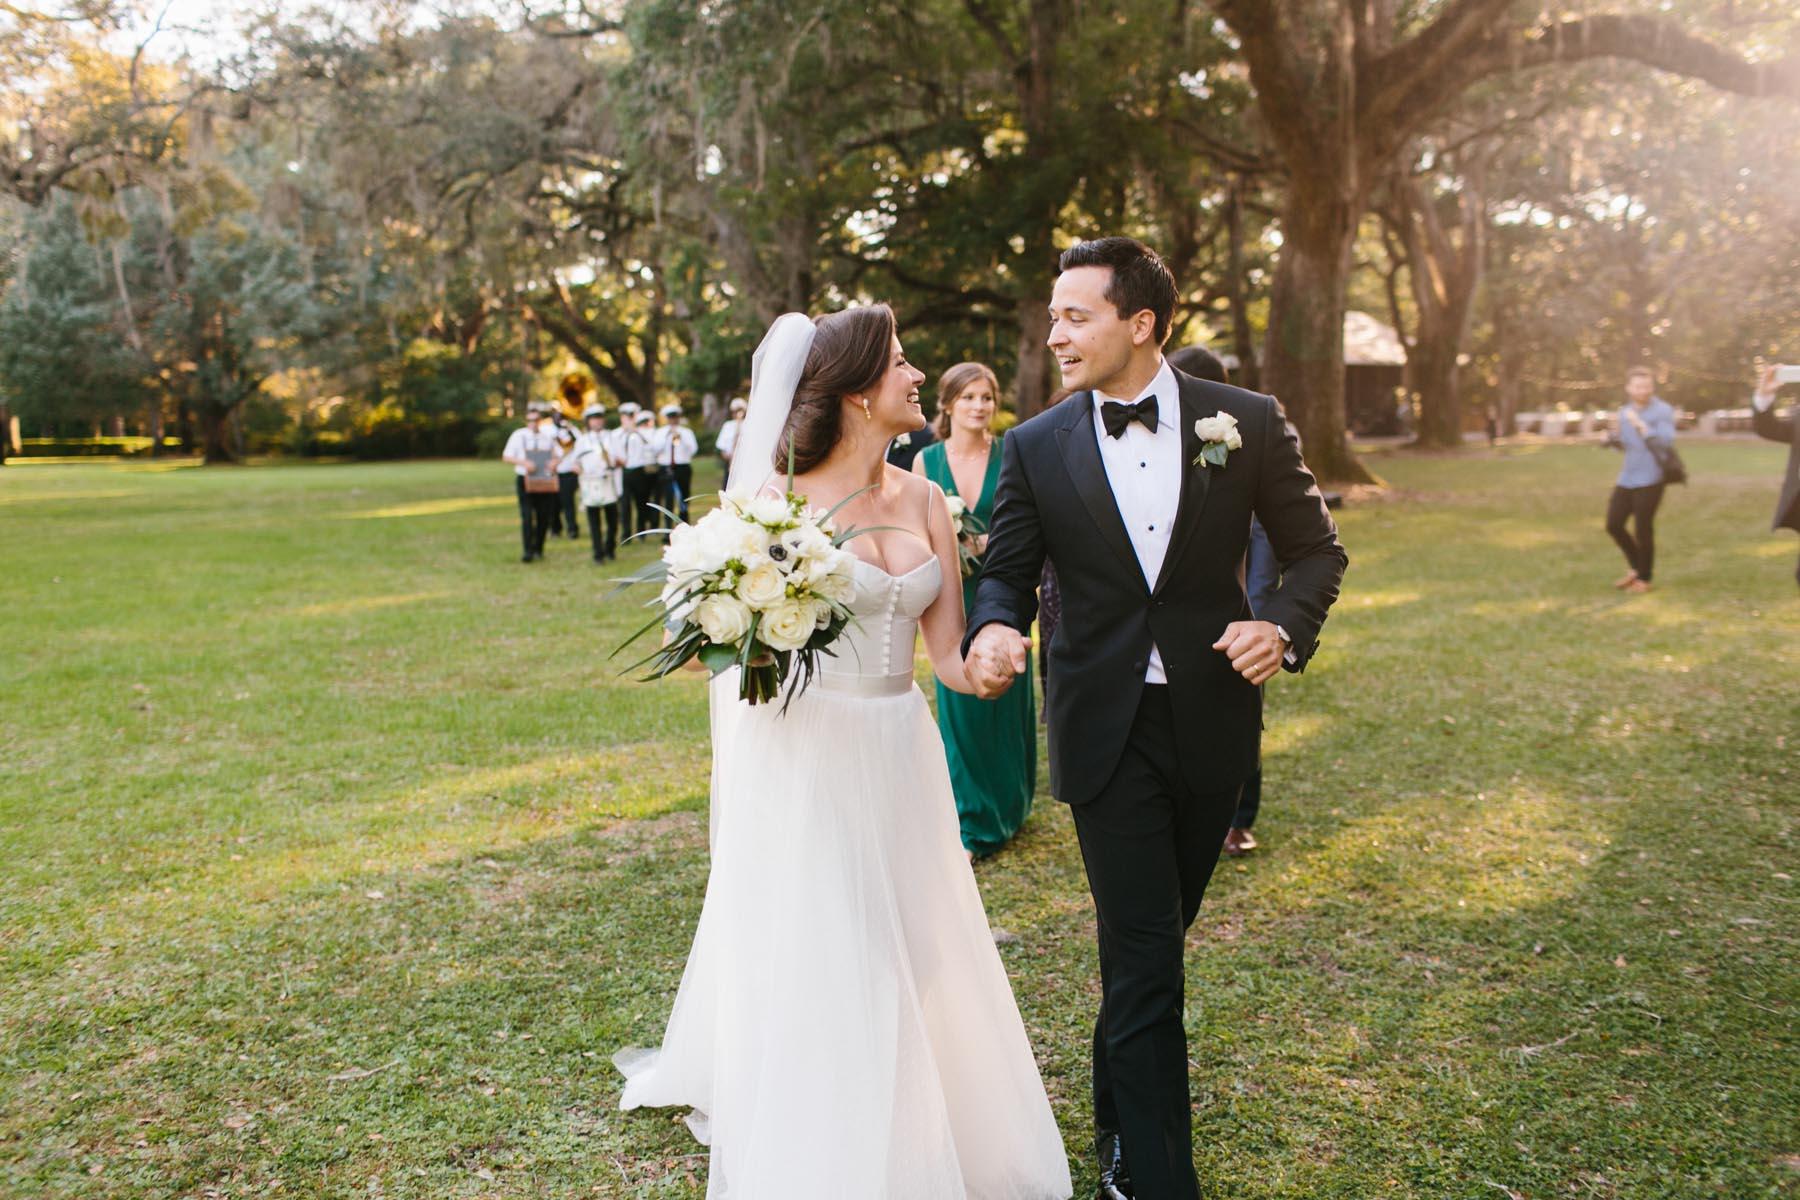 lowry wedding blog eden garden florida wedding-77